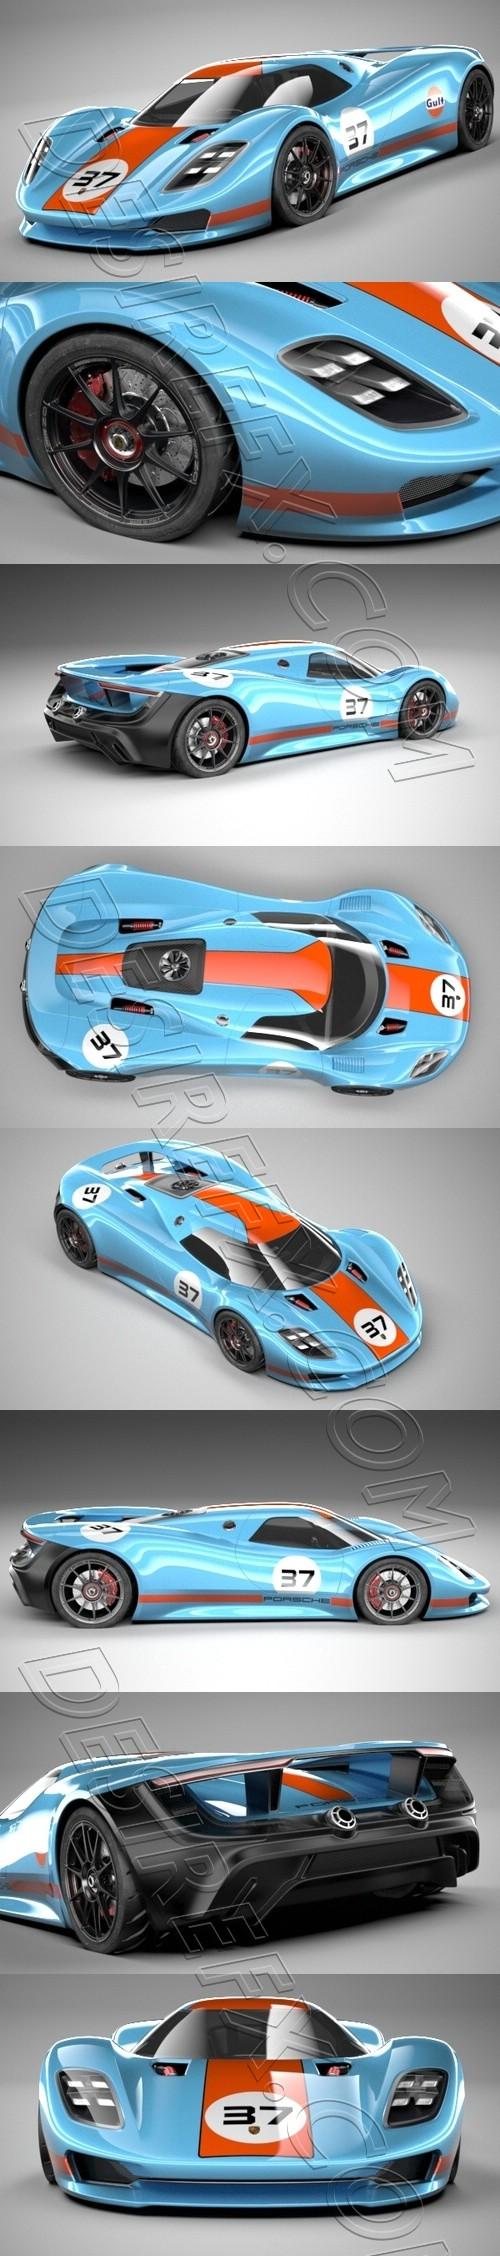 Porsche 917 Concept 3D Model